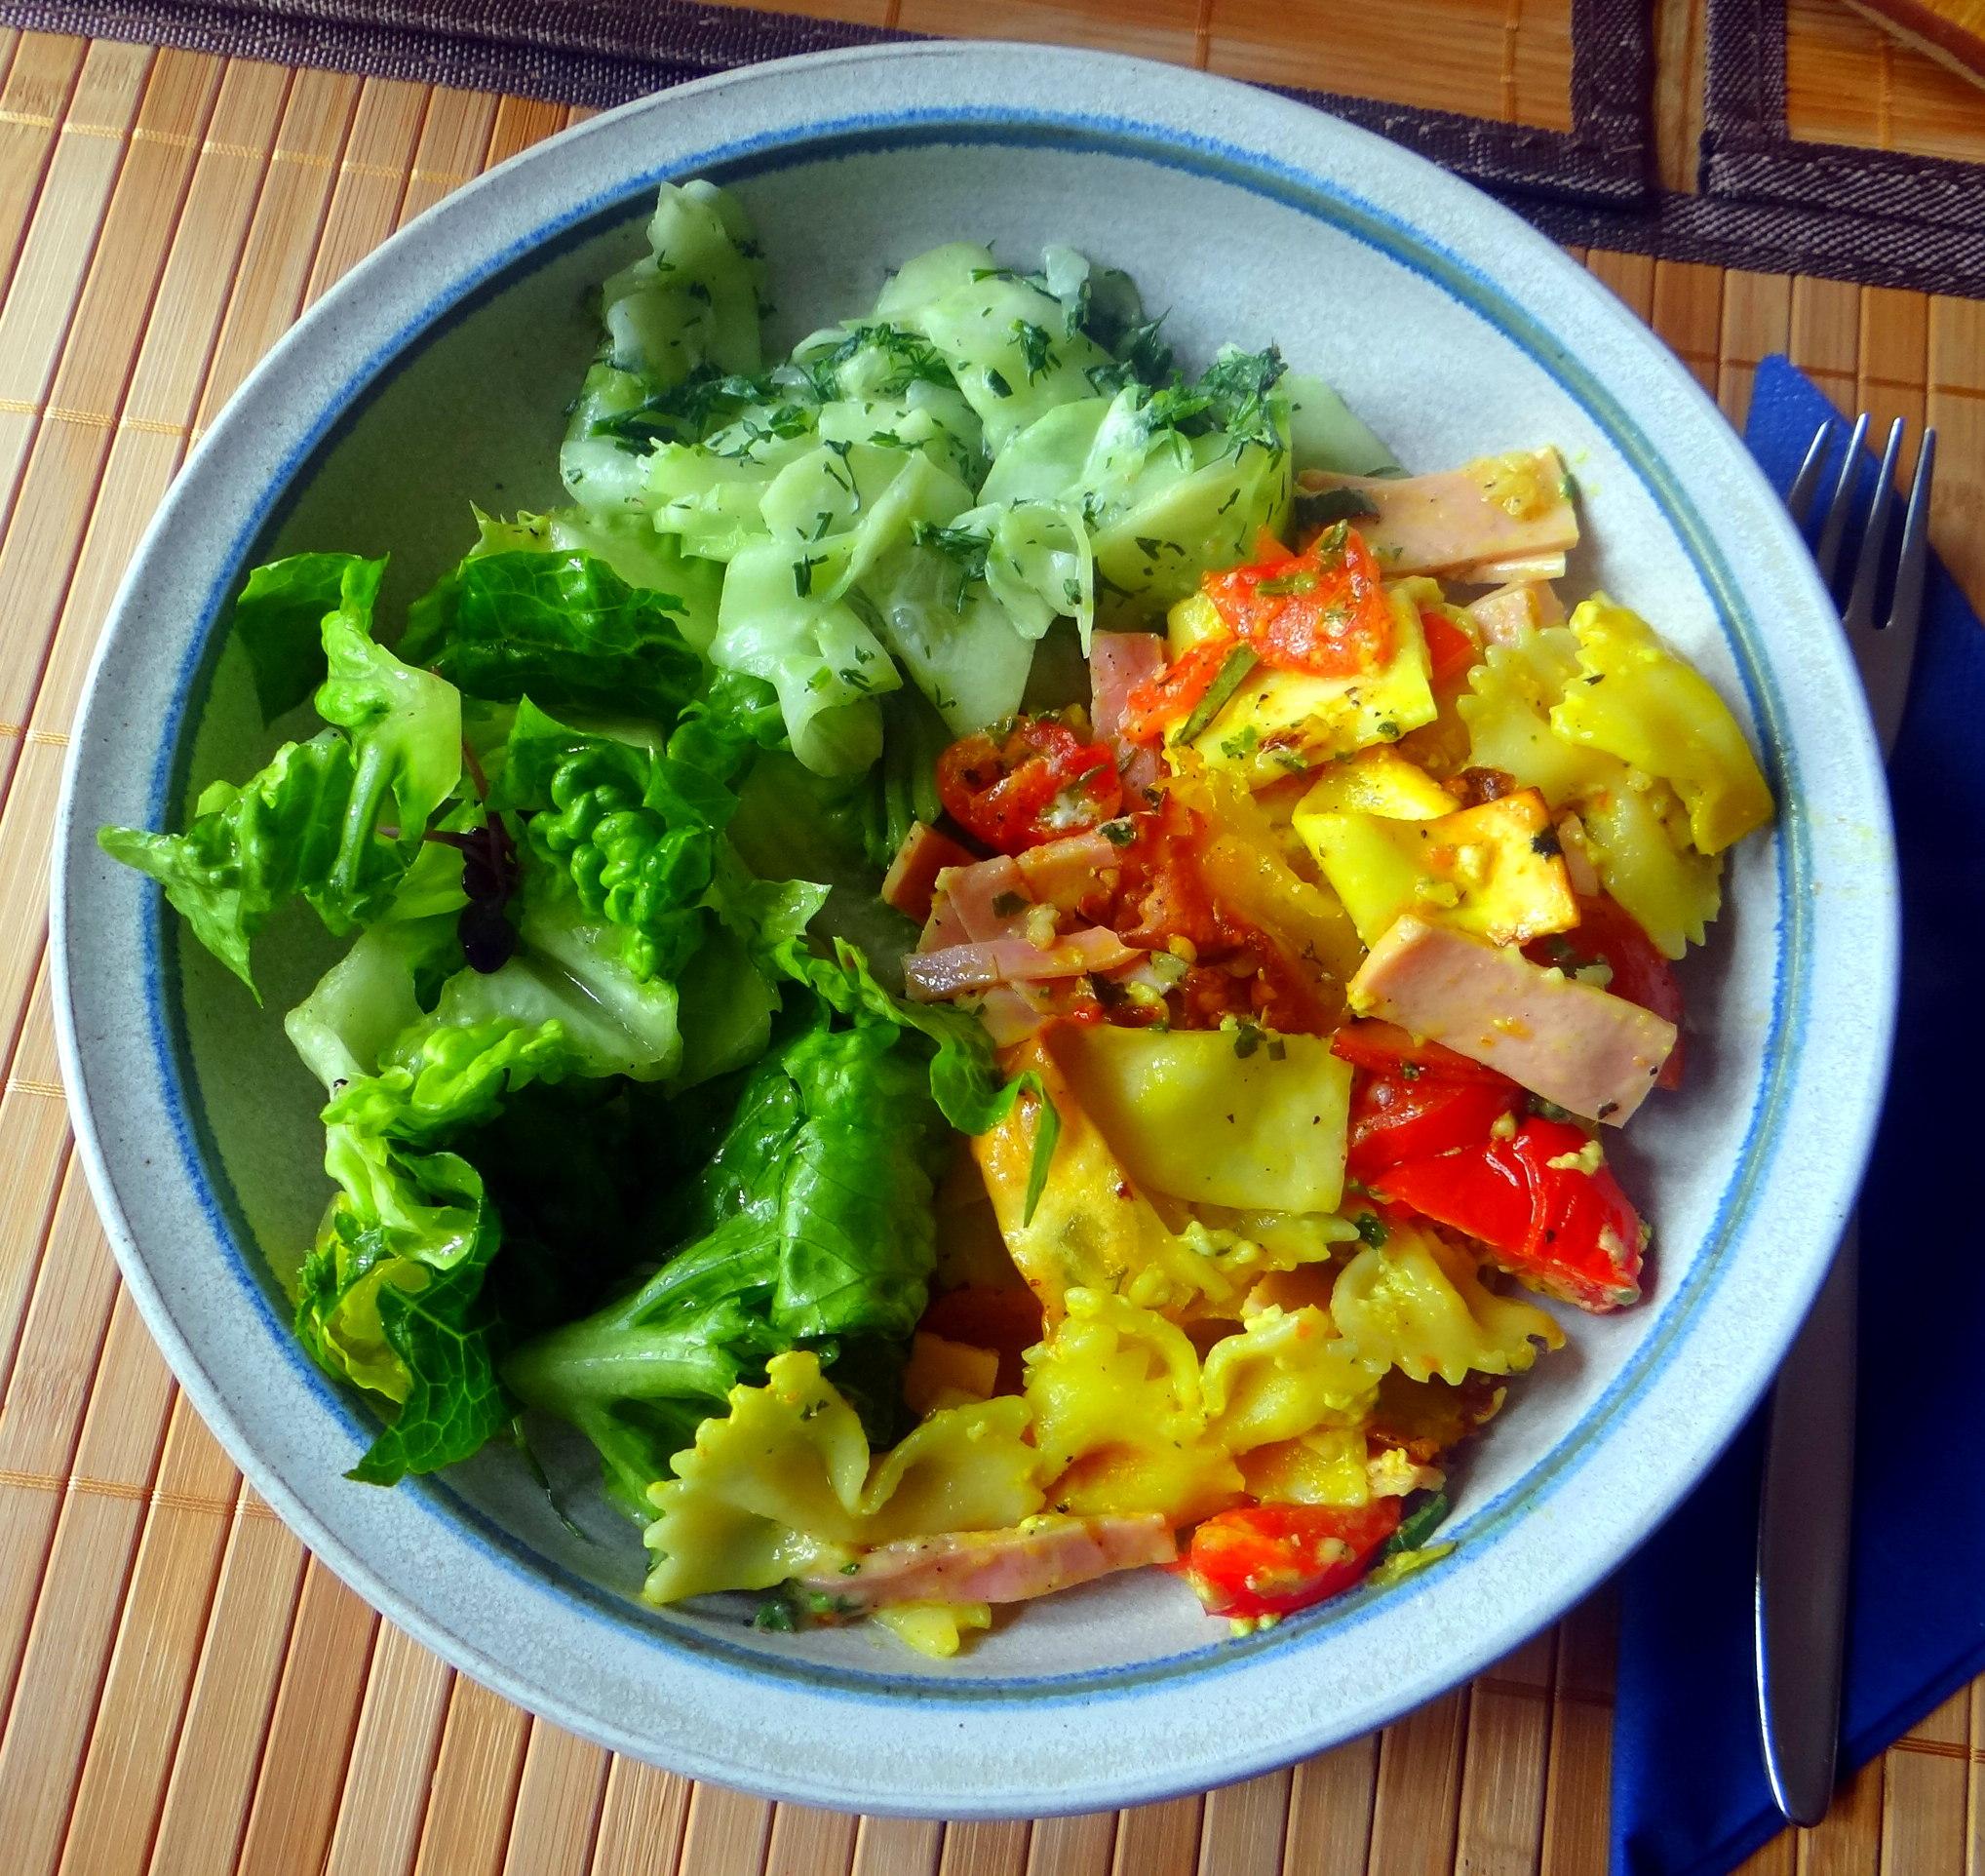 Resteessen,Gurkensalat,Romasalat (1)